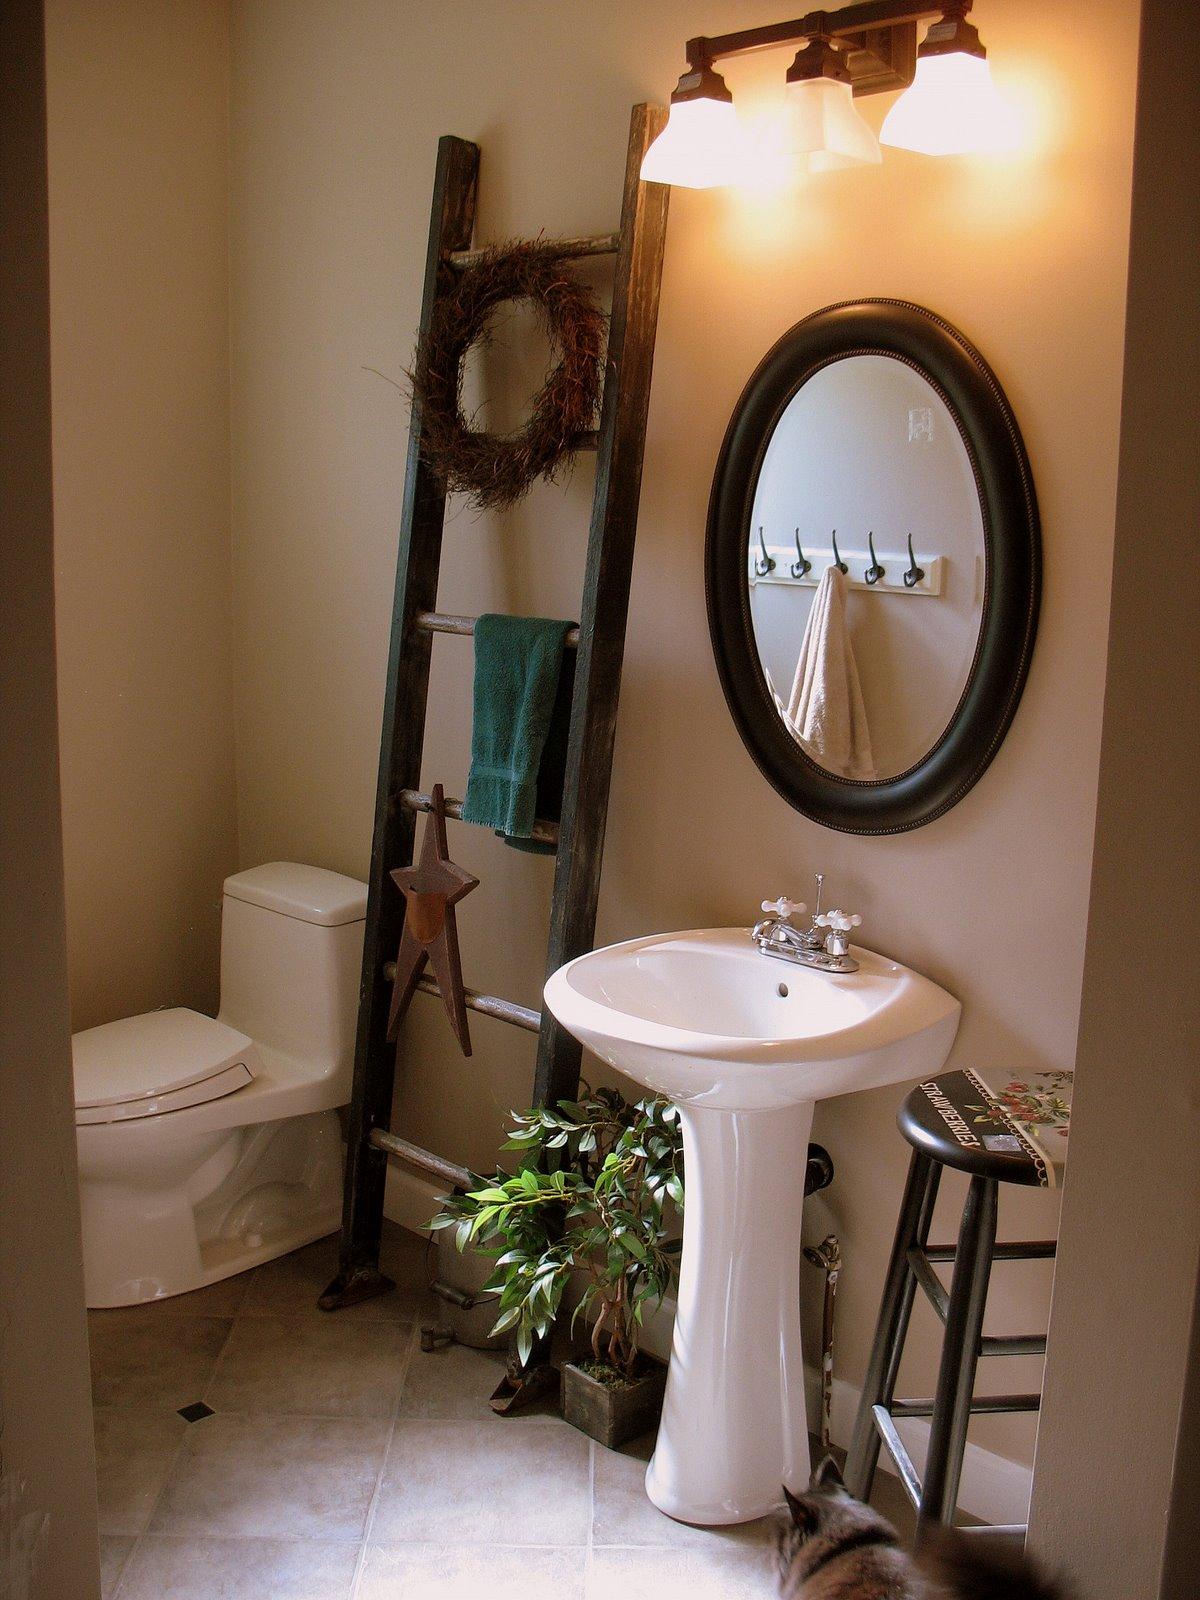 302 found - Decorative ladder for bathroom ...